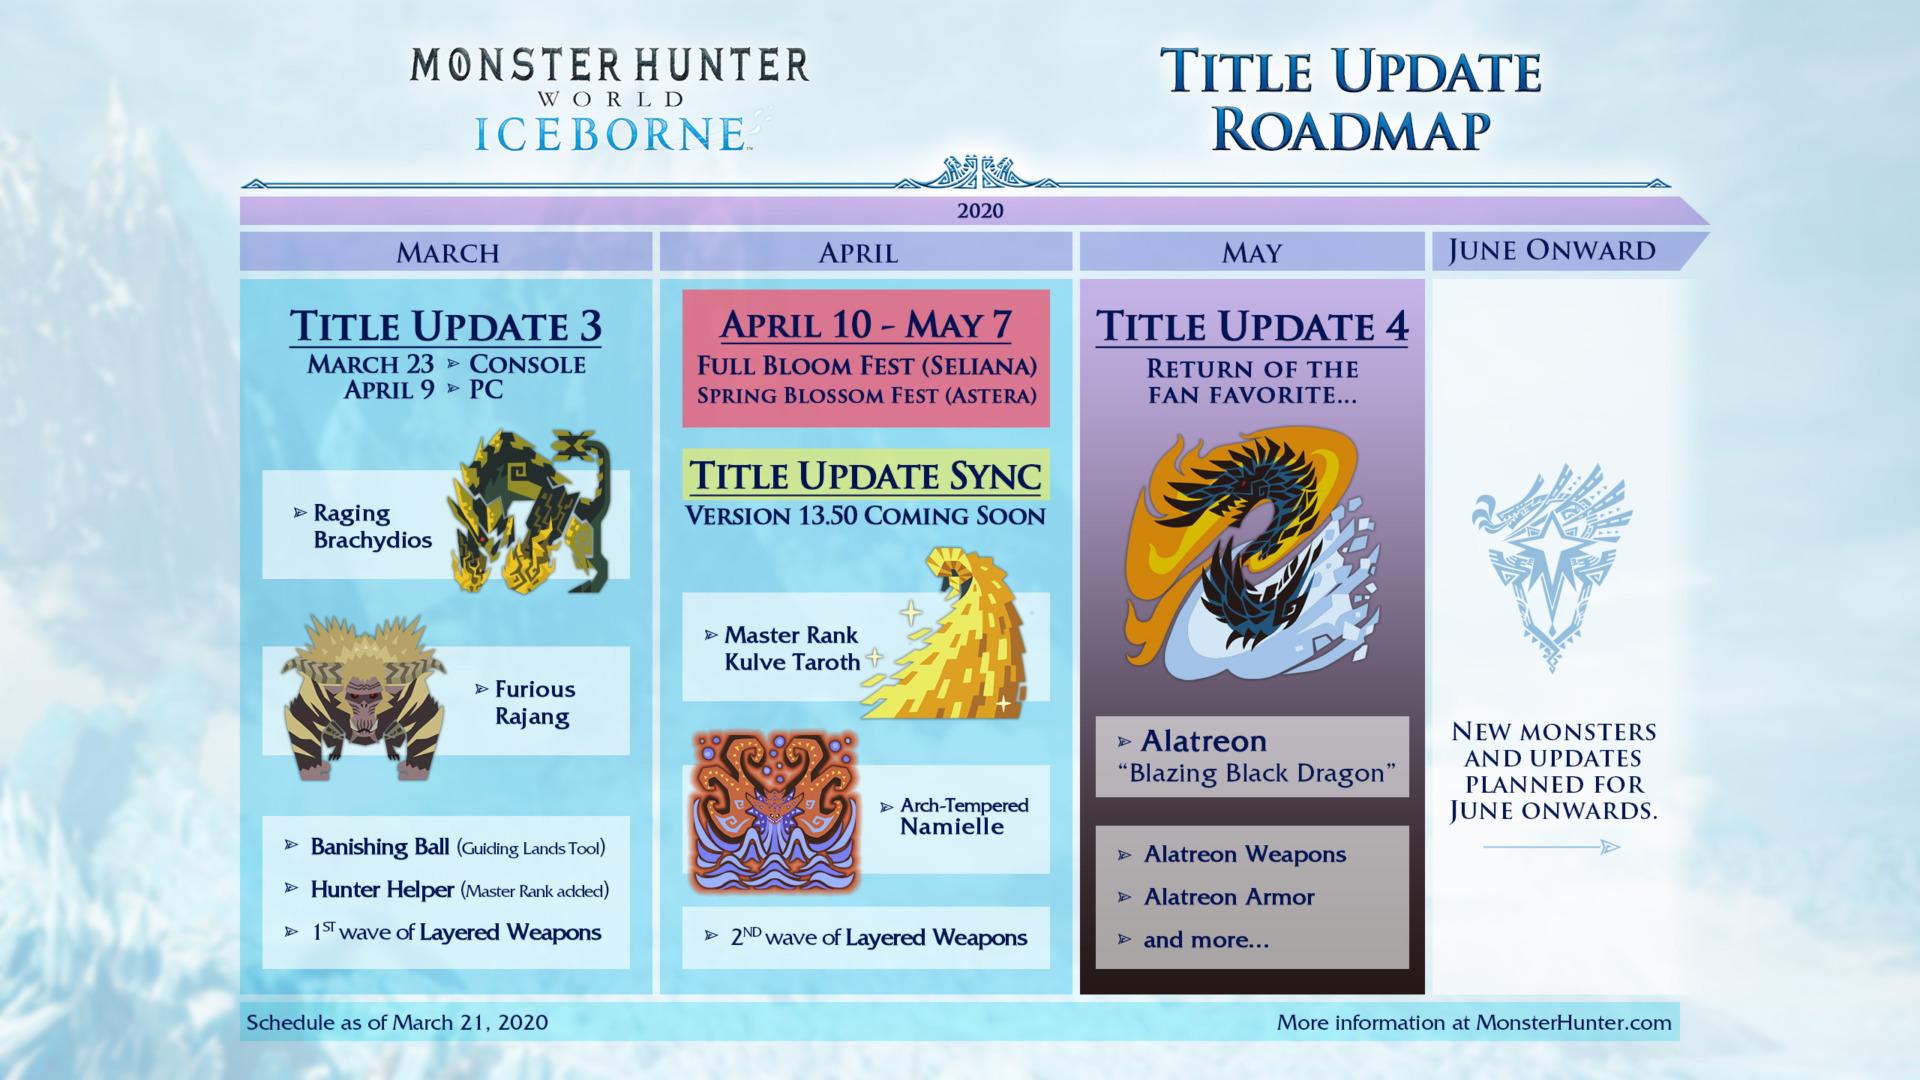 Monster Hunter: World Title Update Road Map